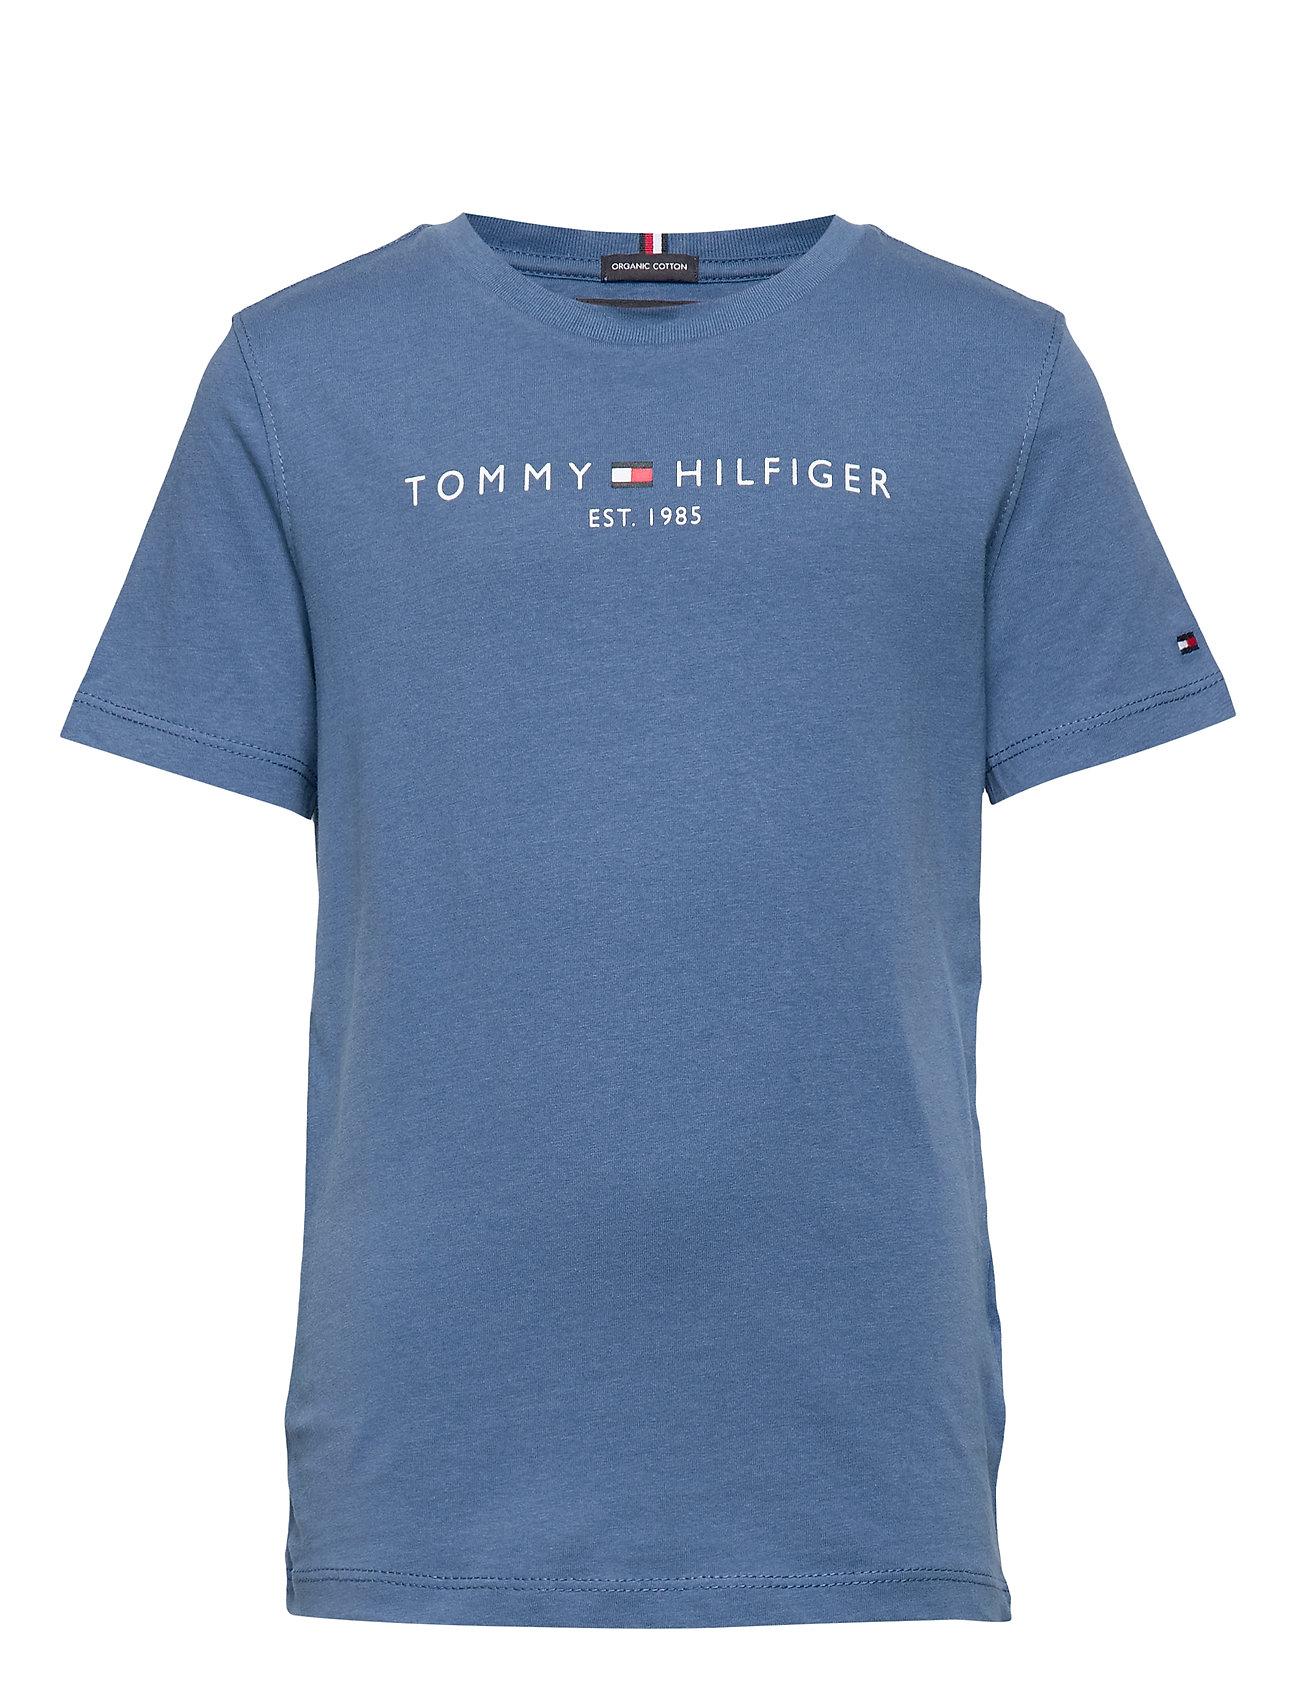 Tommy Hilfiger ESSENTIAL HILFIGER T - DUTCH BLUE